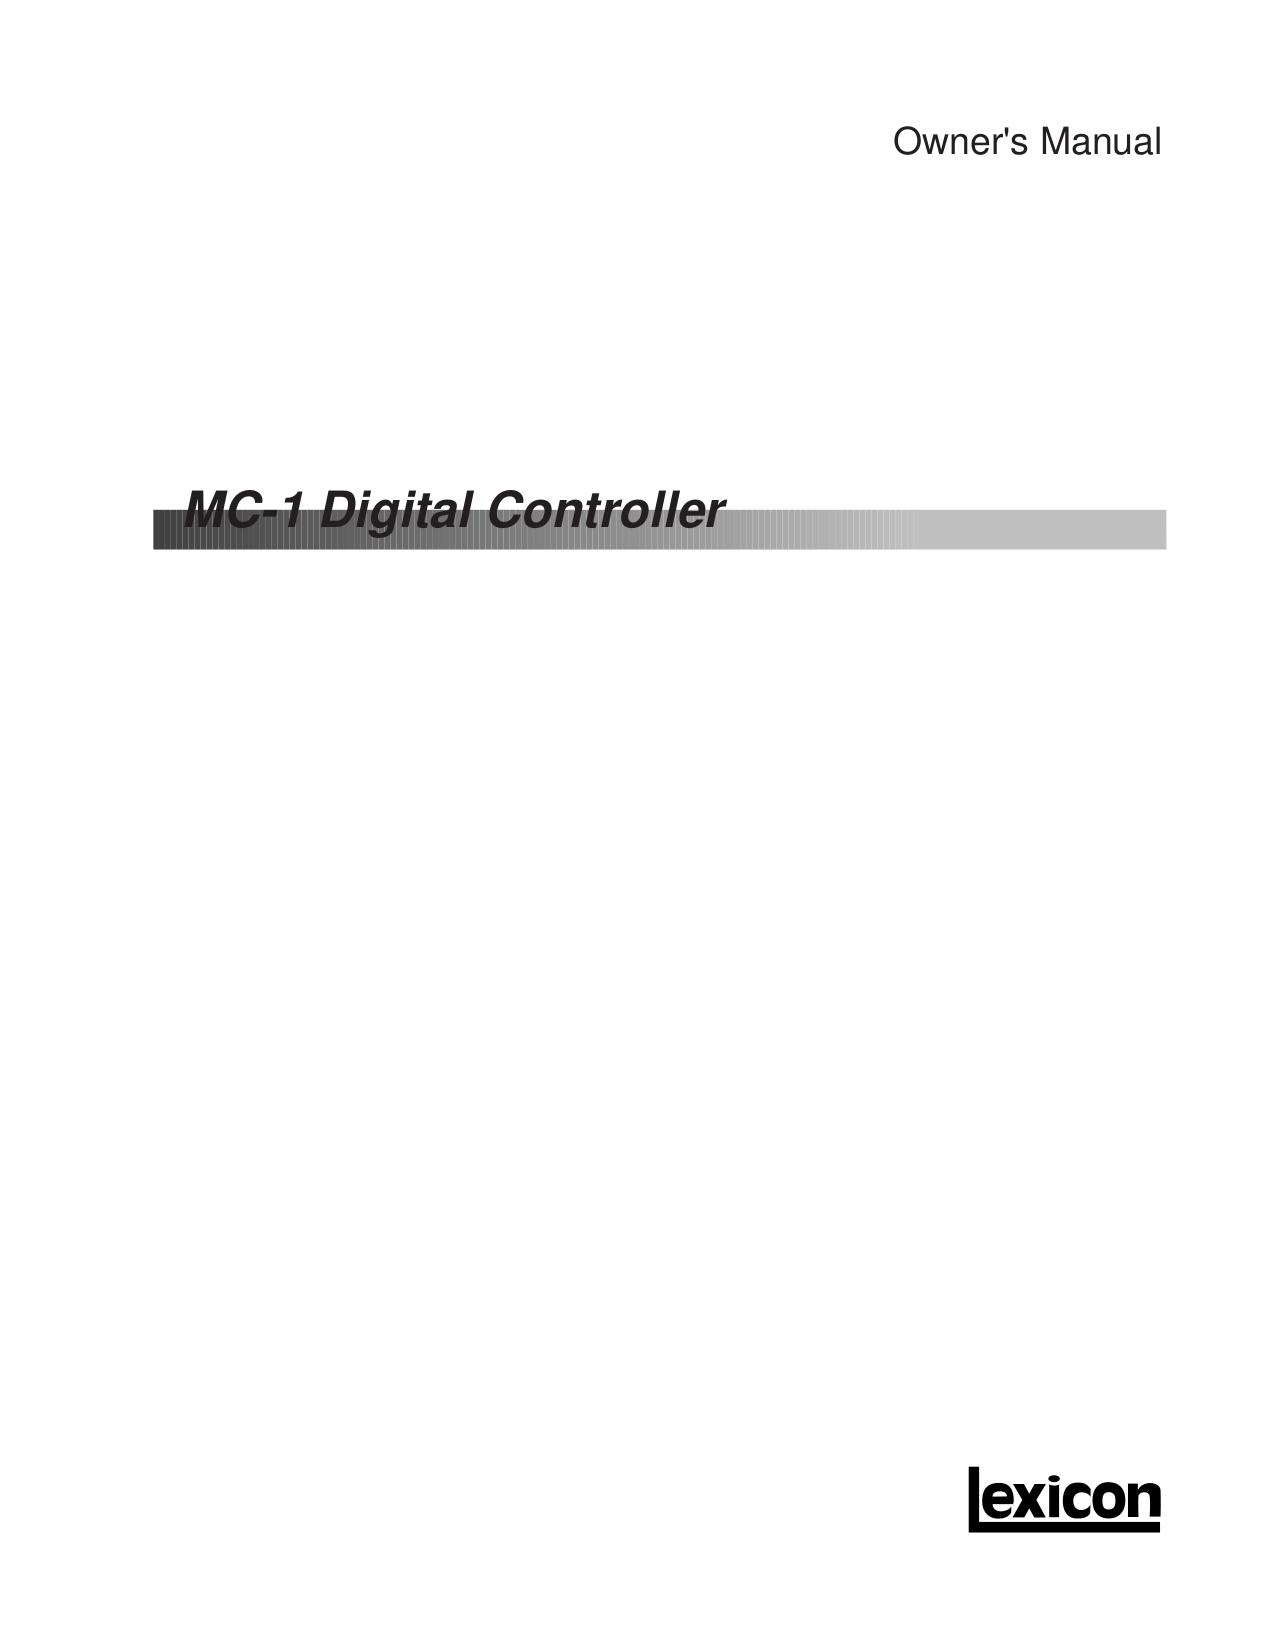 pdf for Lexicon Receiver MC-4 manual